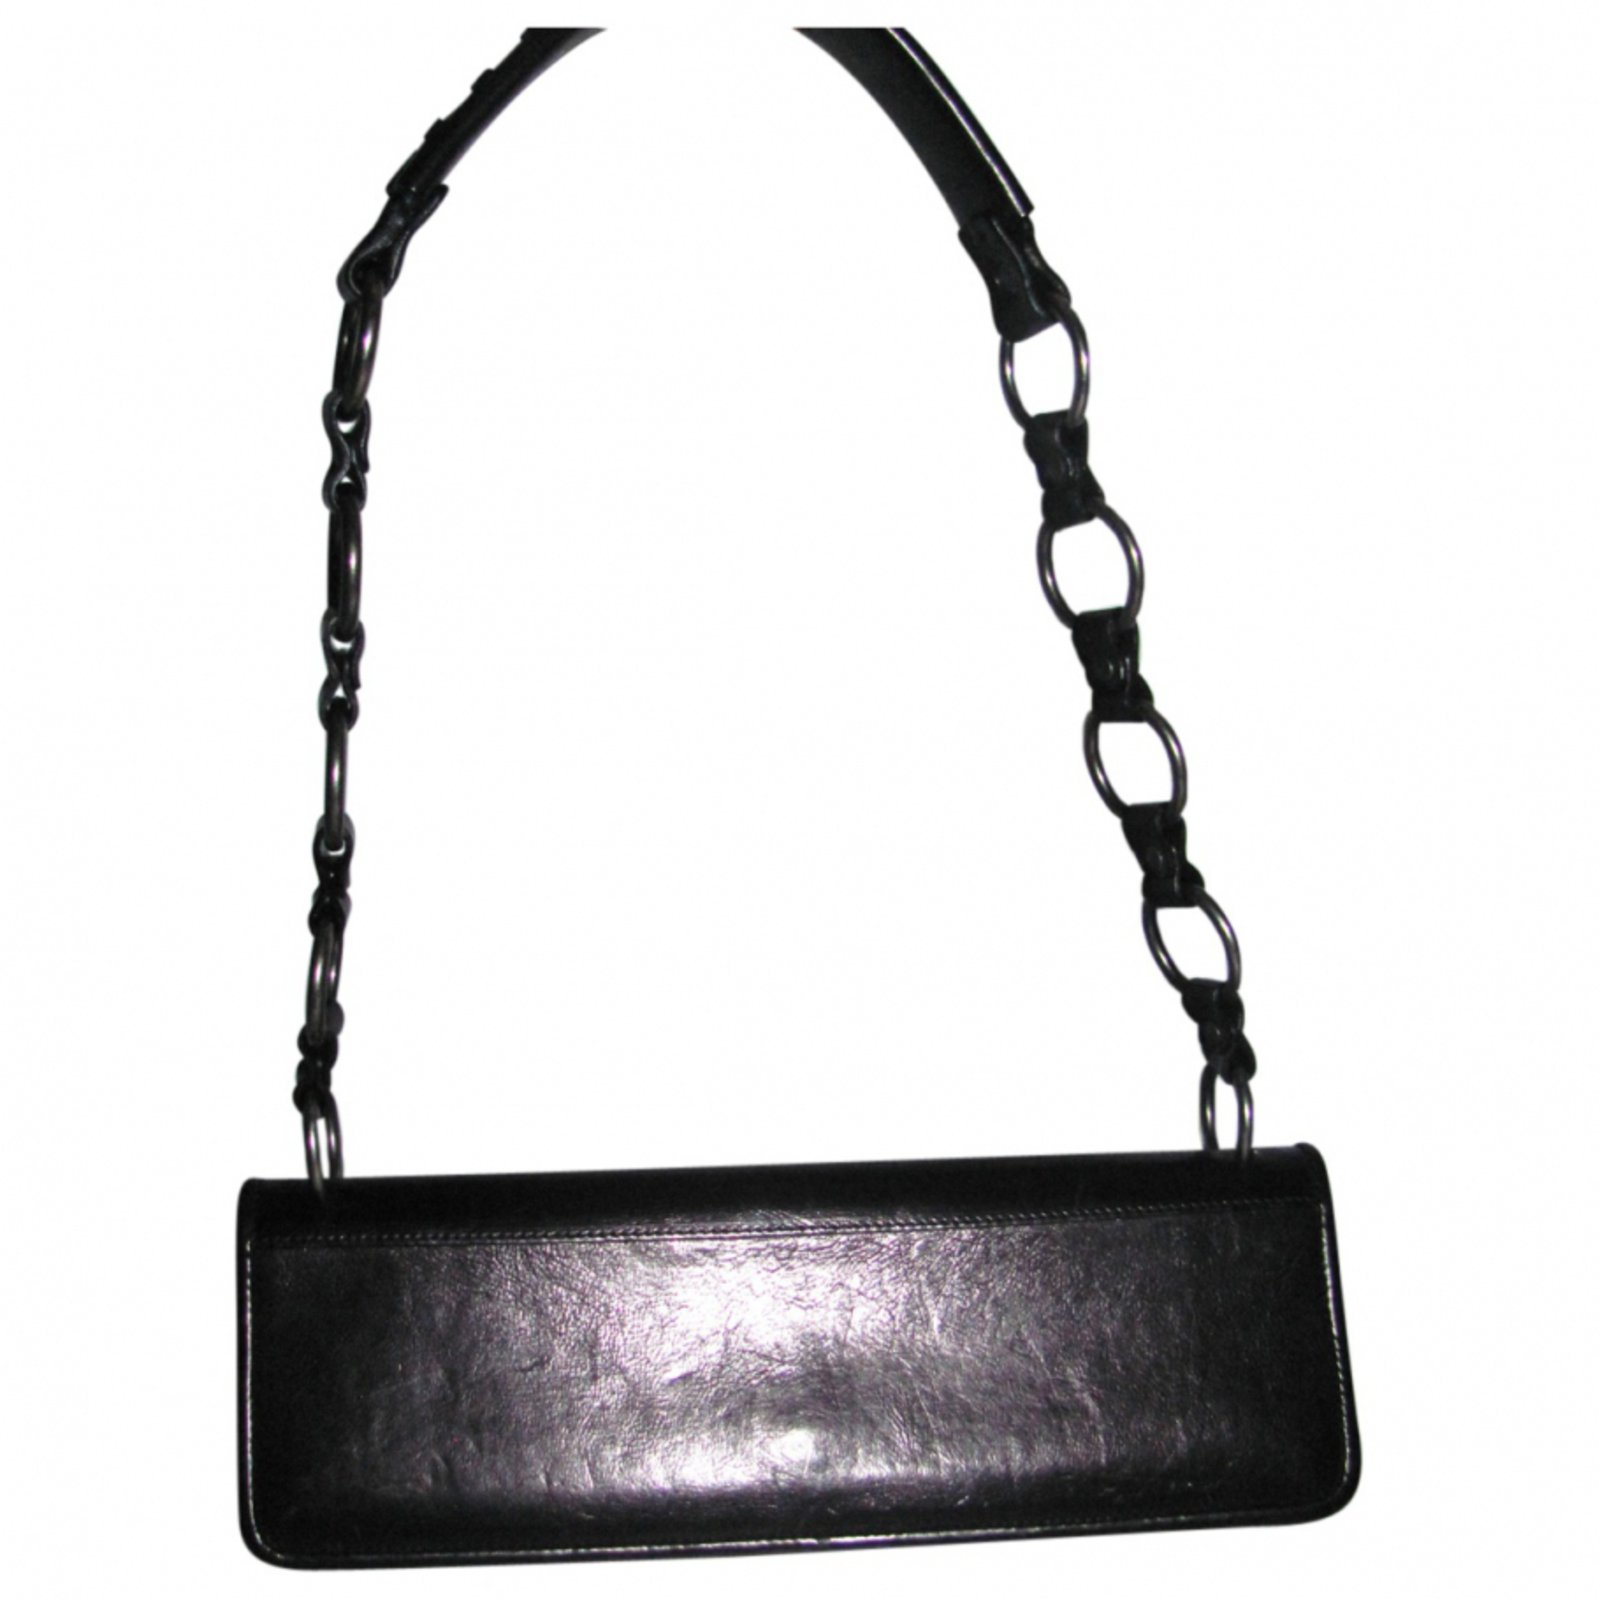 Yves Saint Laurent Handbags Handbags Leather Brown ref.9924 - Joli ... 8c18ace3a6feb